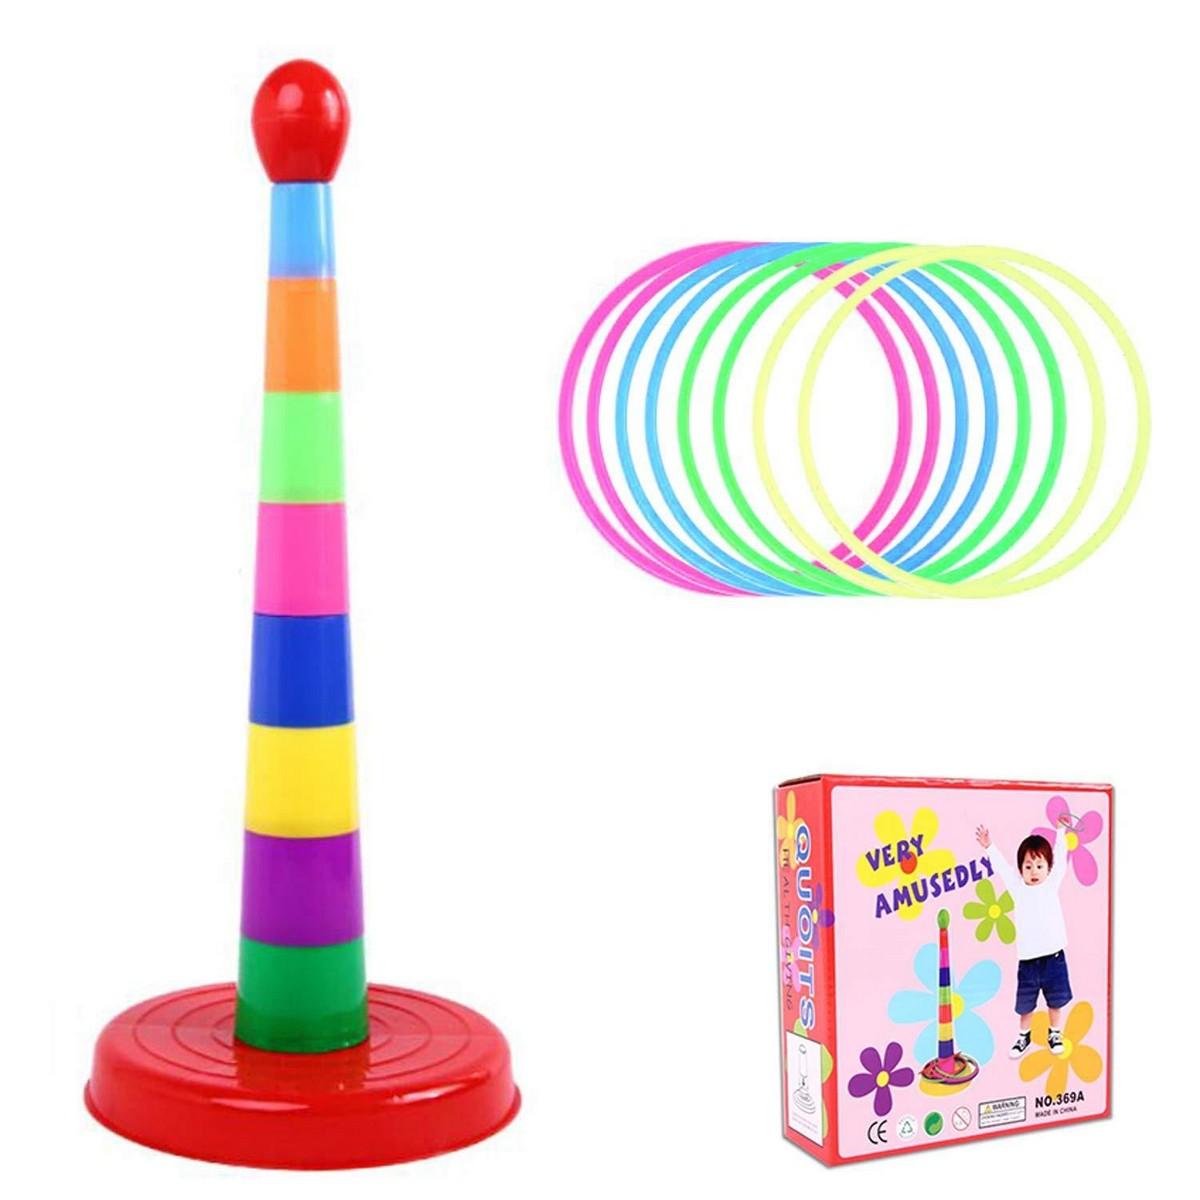 Ring tower game